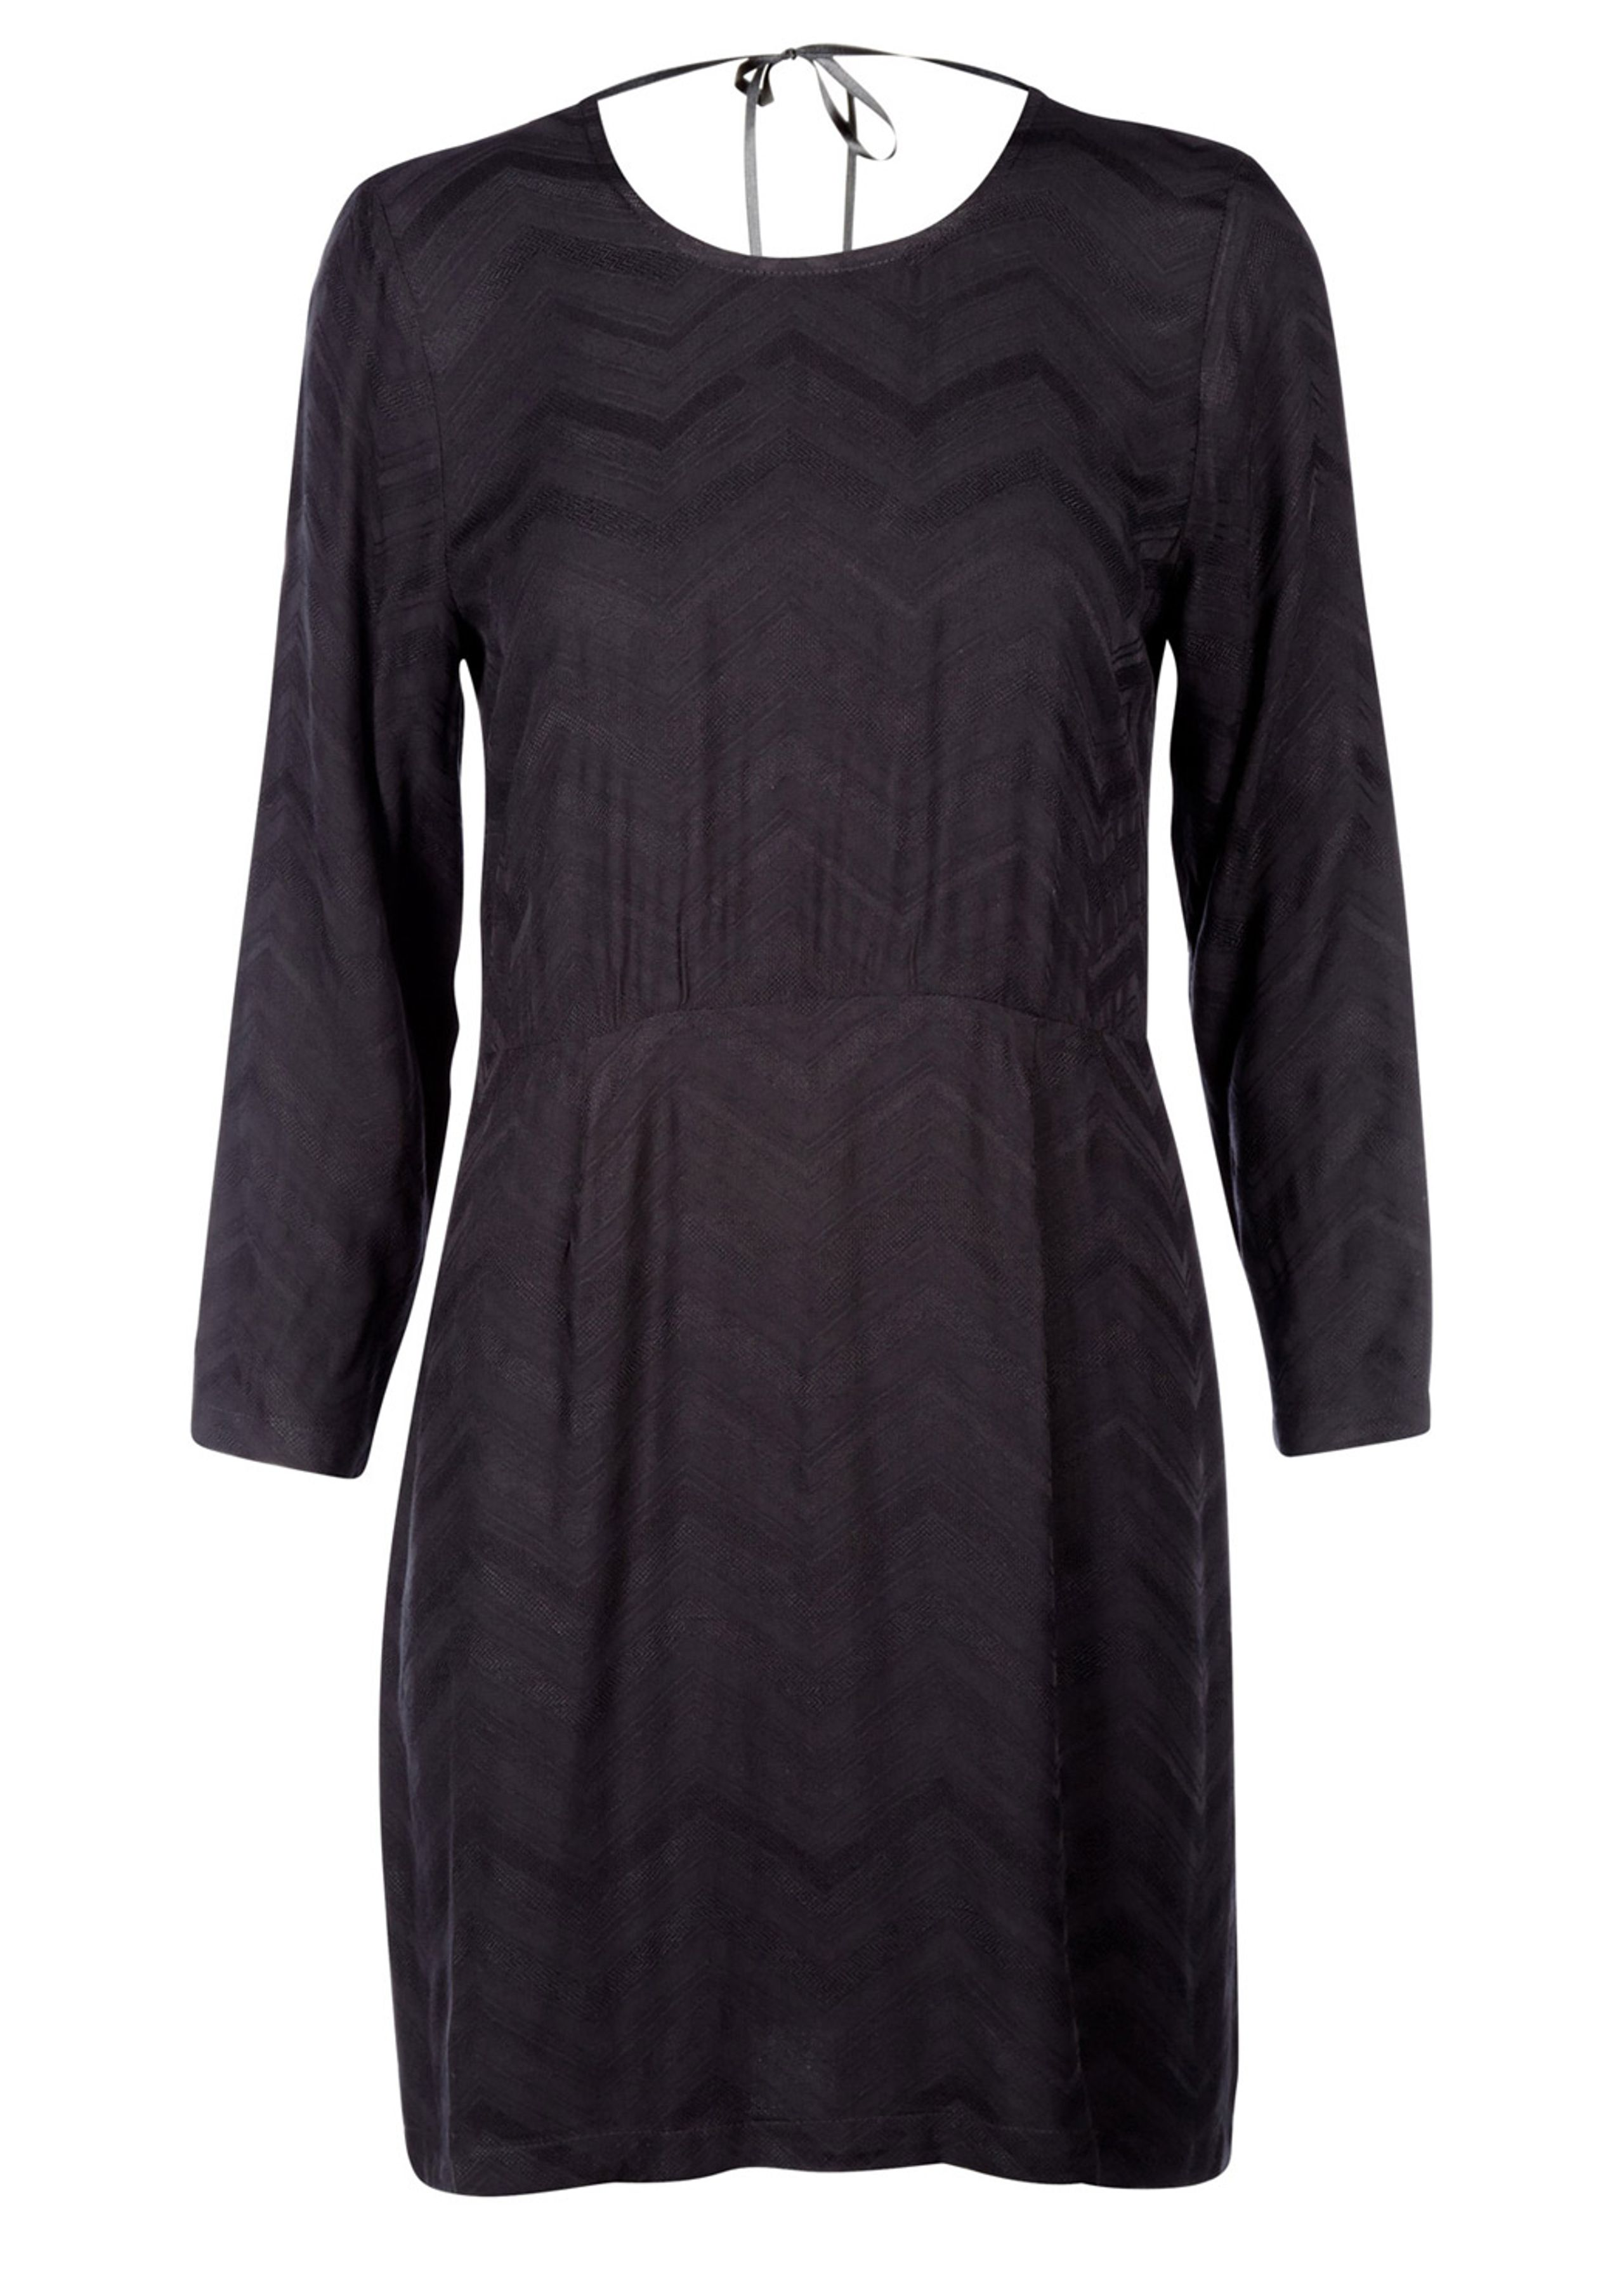 Image of   Saga Dress